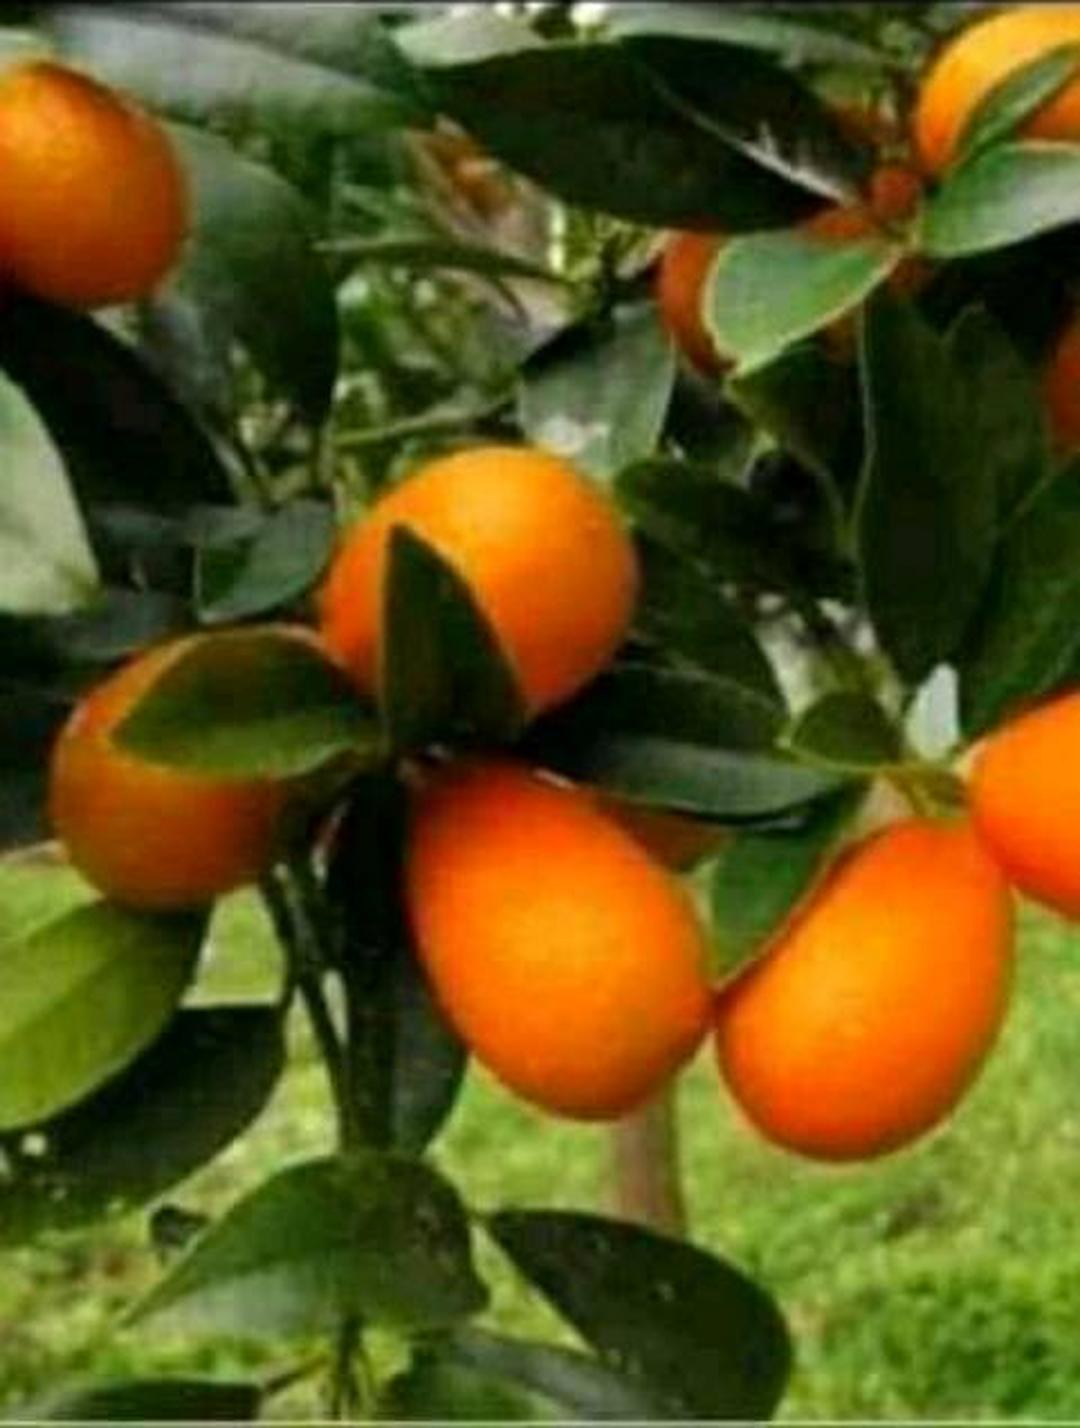 Bisa Partai Besar! bibit jeruk nagami bibit tanaman buah buahan benih buah buahan bibit pohon buah benih tanaman buah Kota Bogor #bibit buah genjah termurah